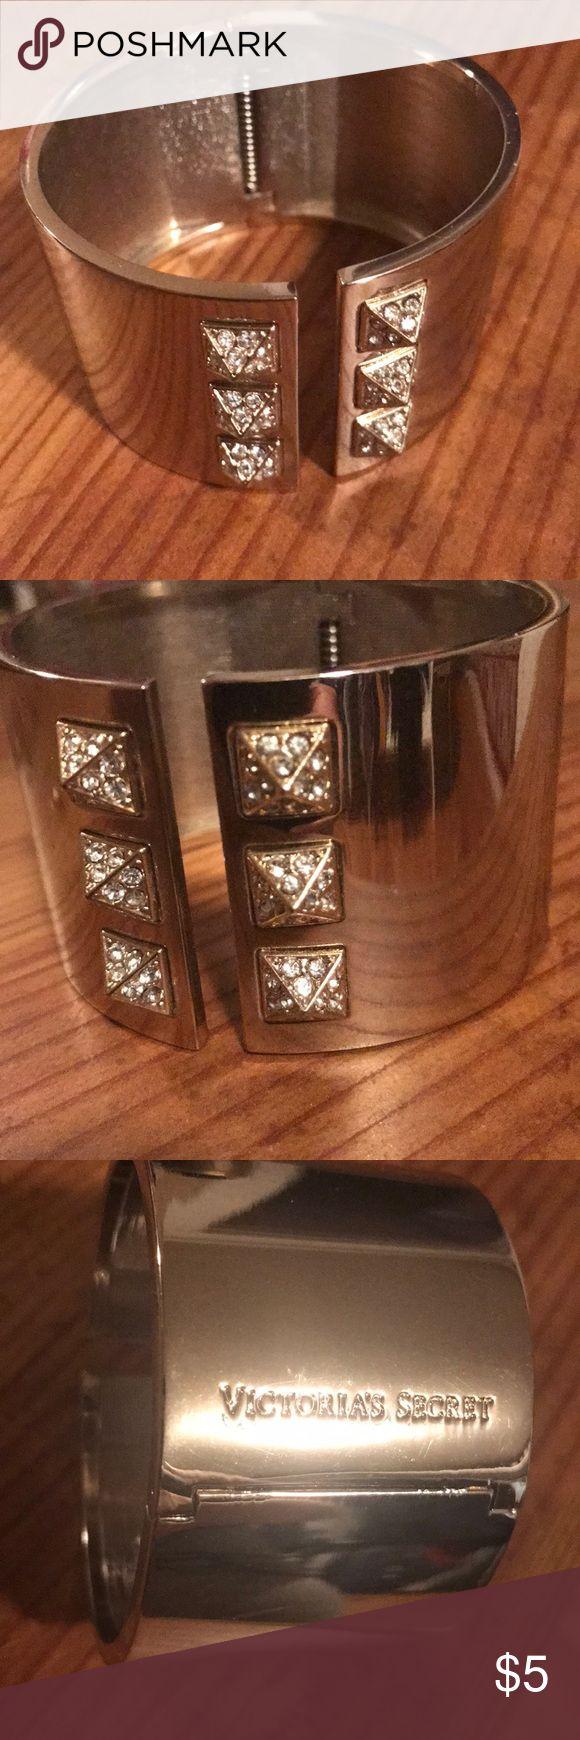 Victoria's Secret Bracelet and/or Arm Band VS silver bracelet and/or arm band Victoria's Secret Jewelry Bracelets